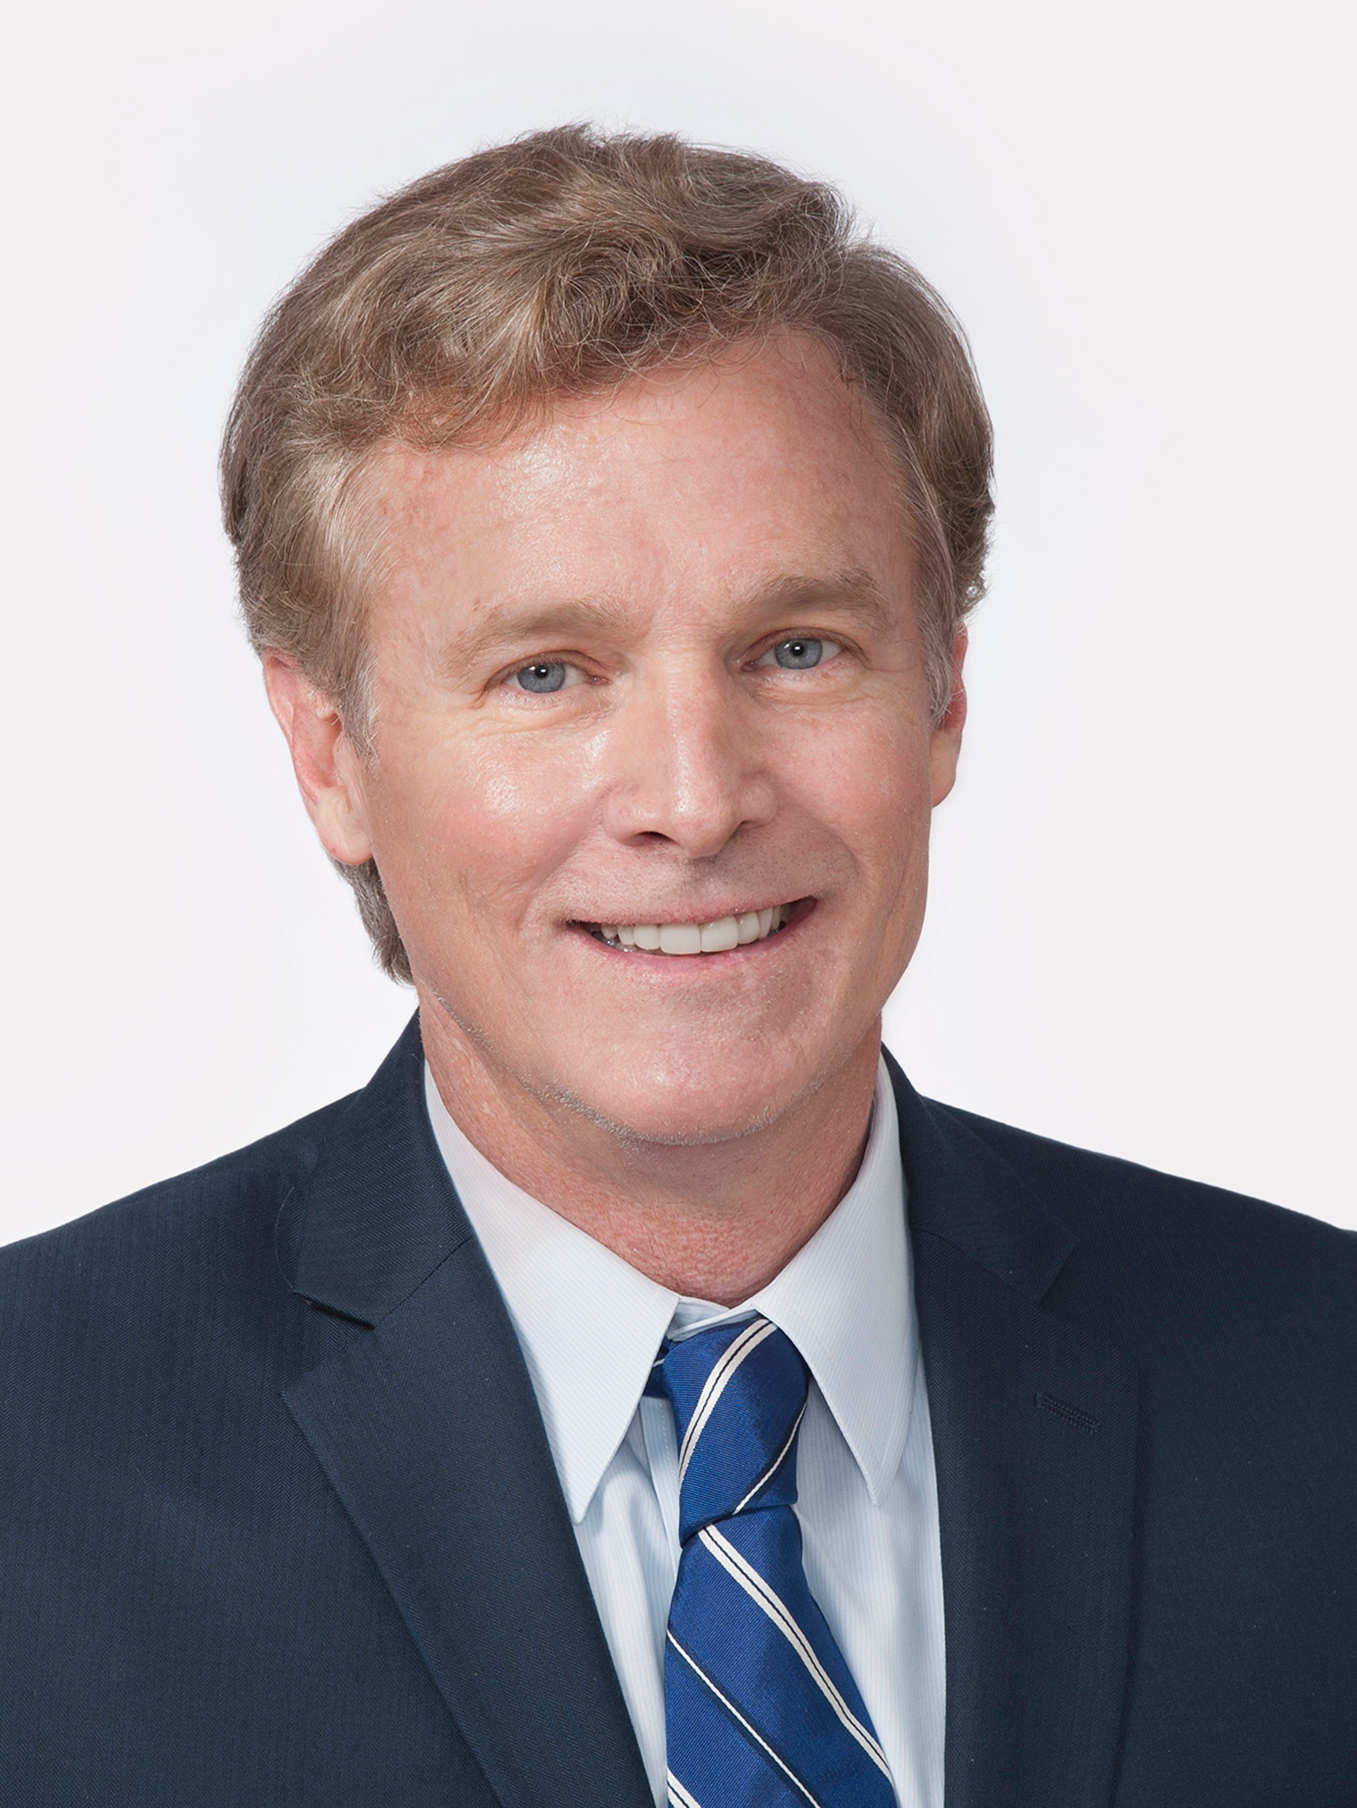 Donald L. Hagan, Partner, Co-founder, Chief Investment Strategist of Day Hagan Asset Management in Sarasota, FL.